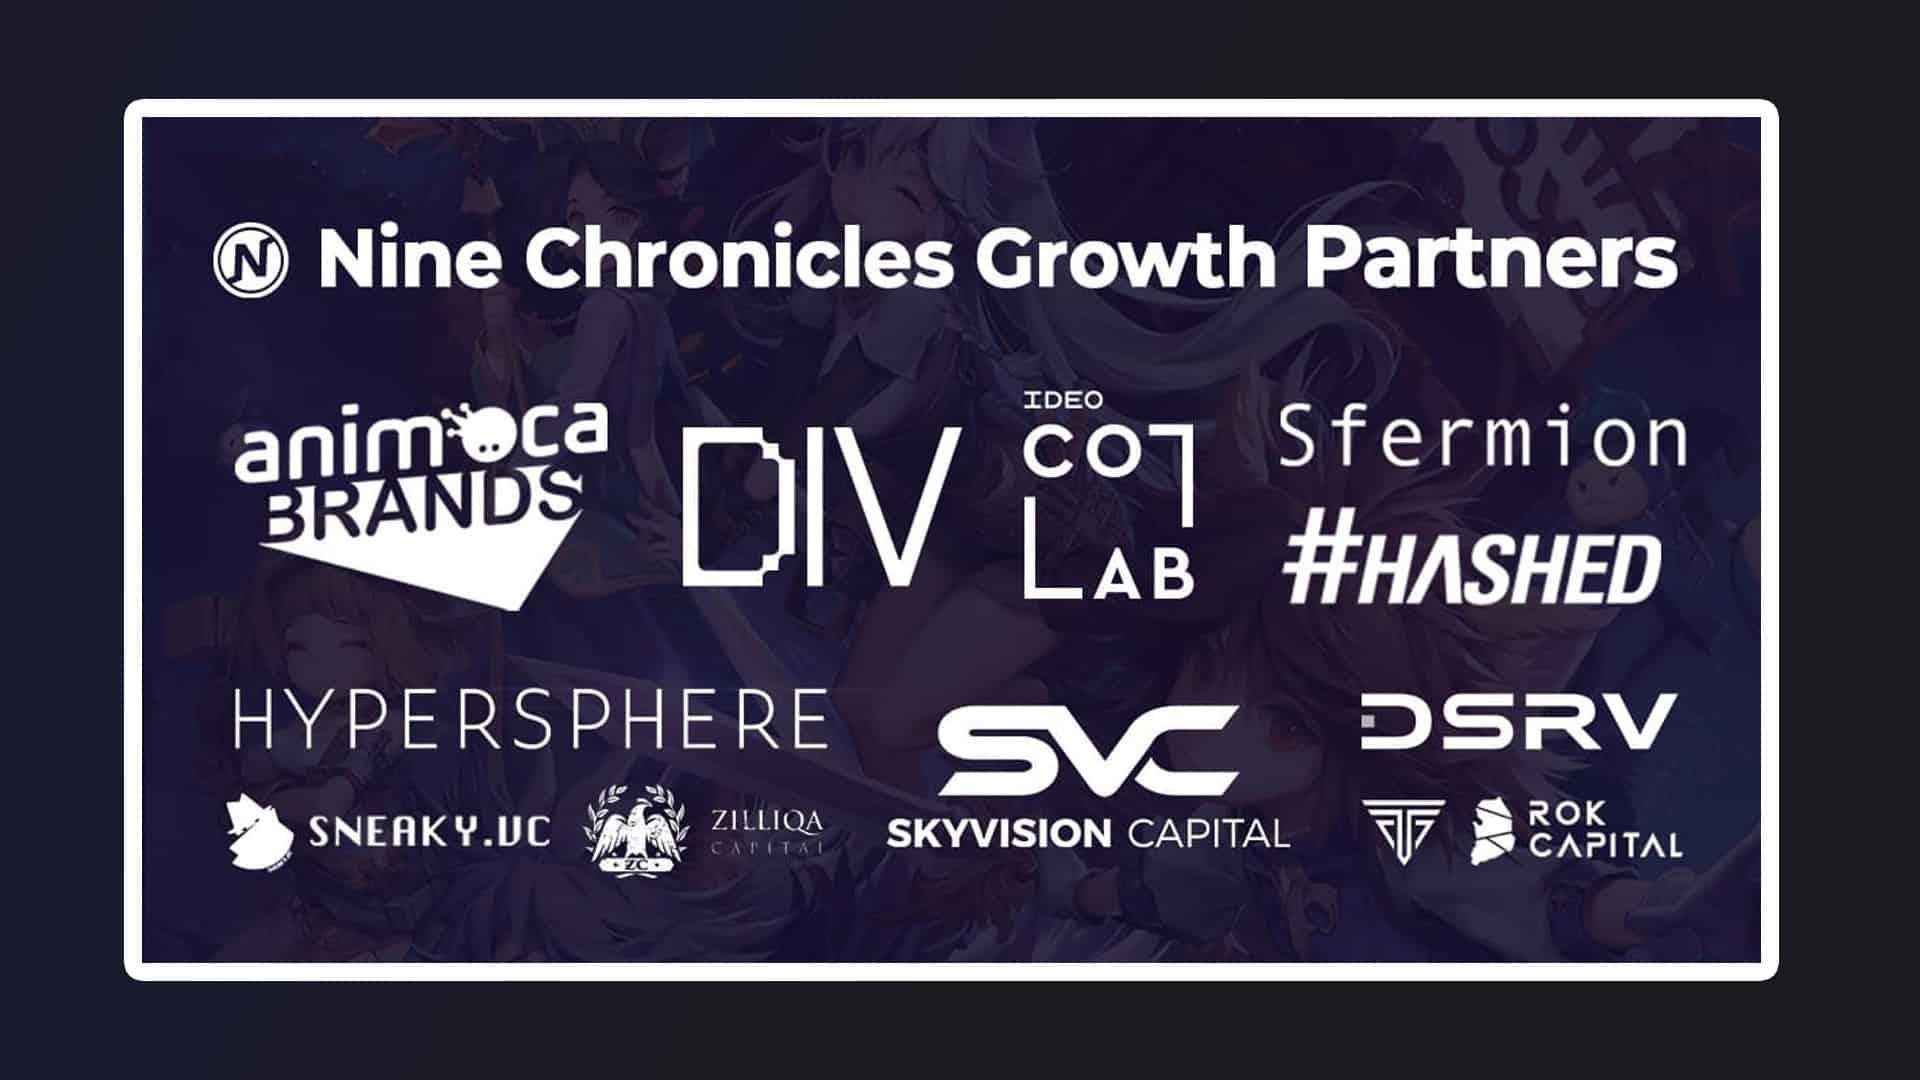 Nine Chronicles Investment